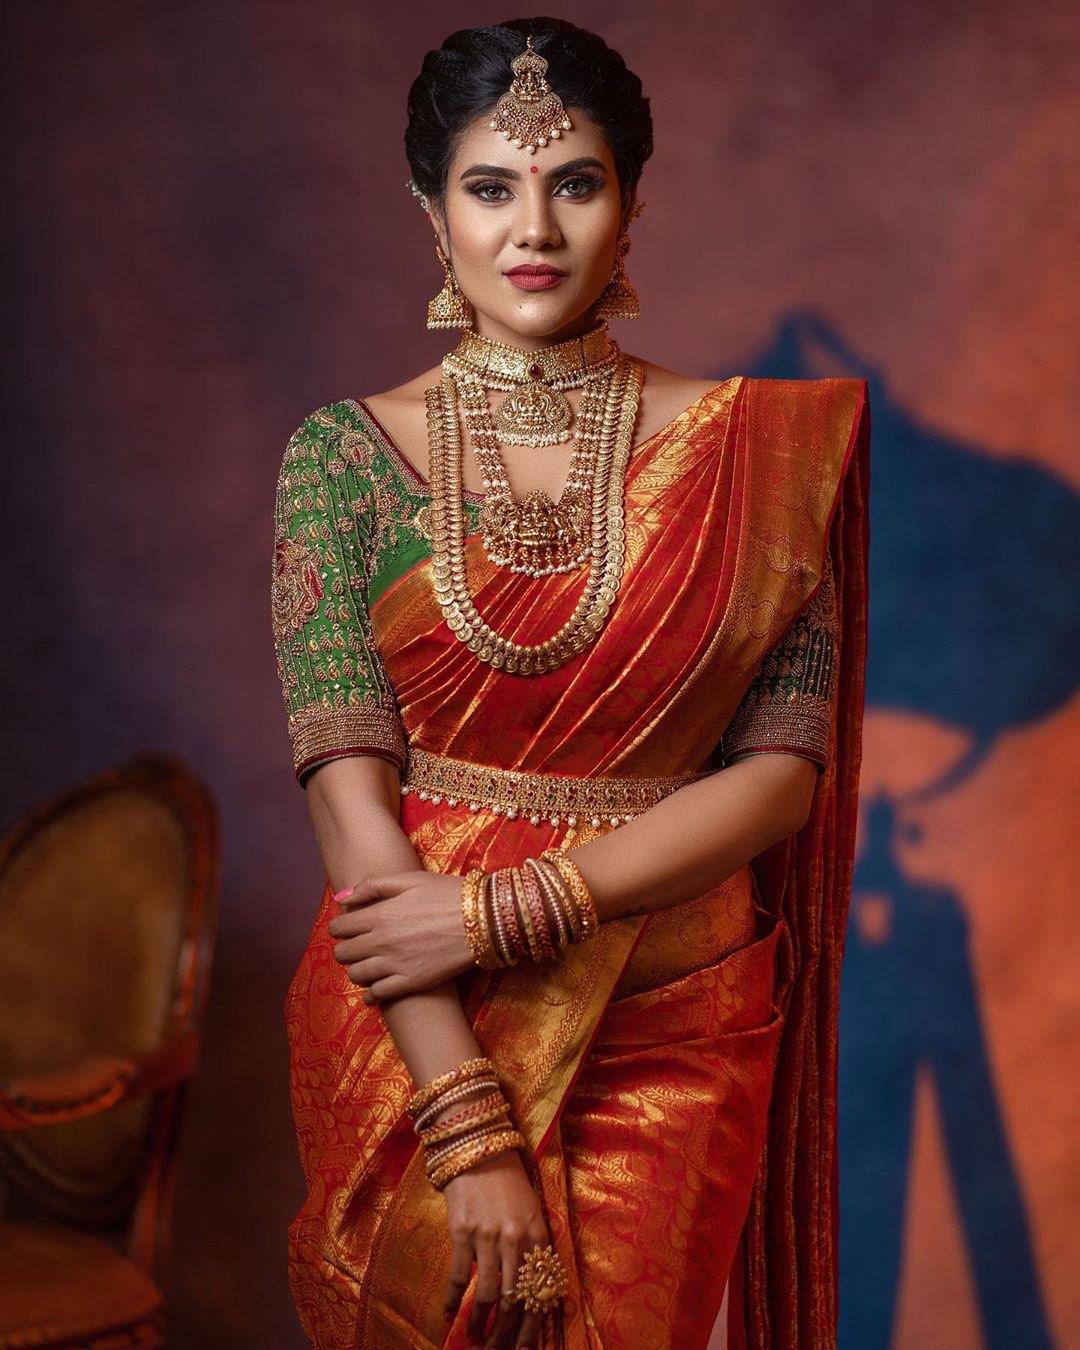 Tamil Actress Roshni Prakash Latest Instagram Pics - Hot